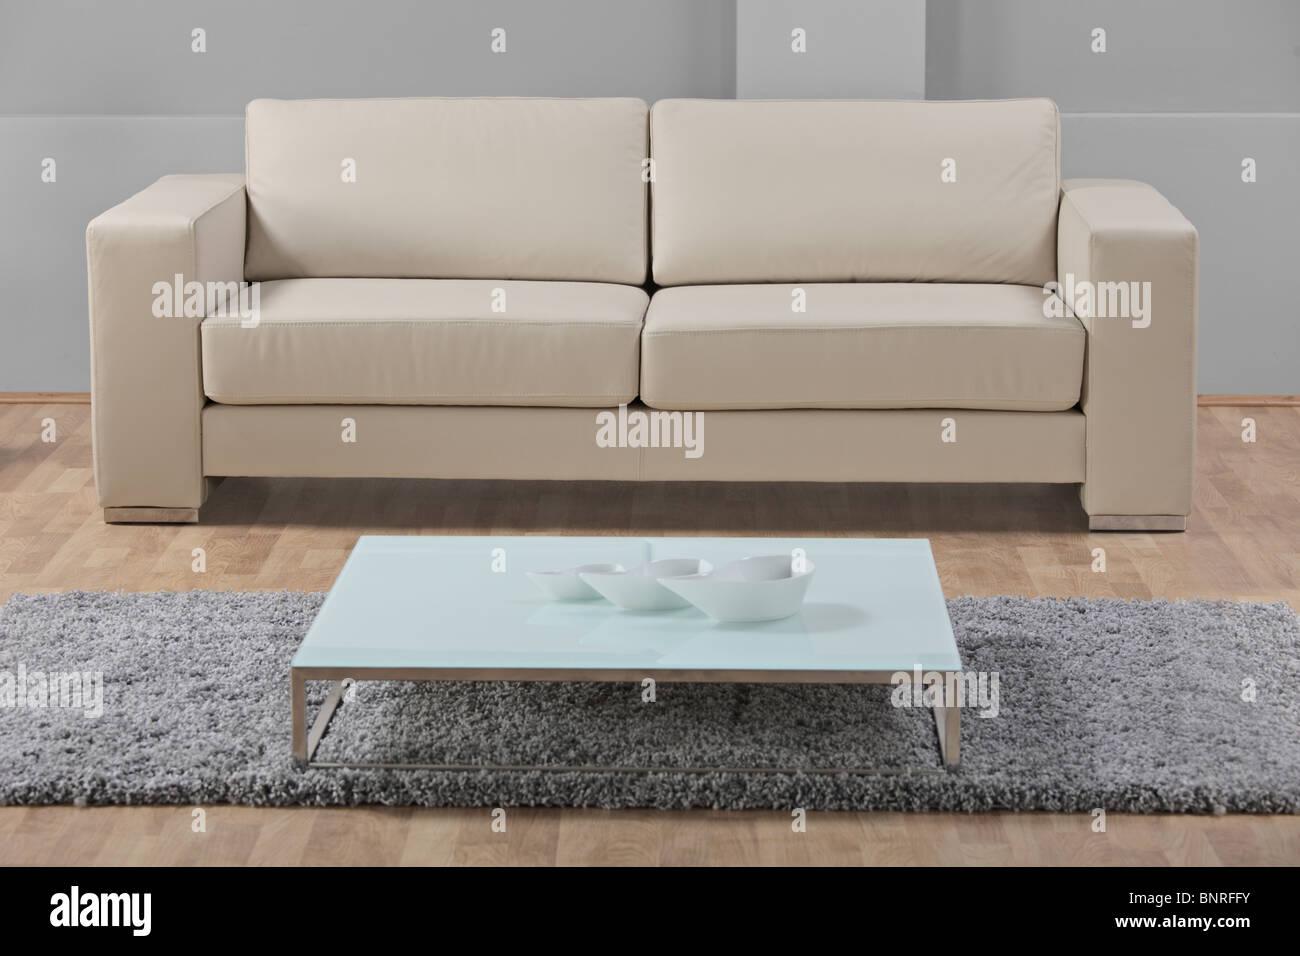 A leather white sofa - Stock Image